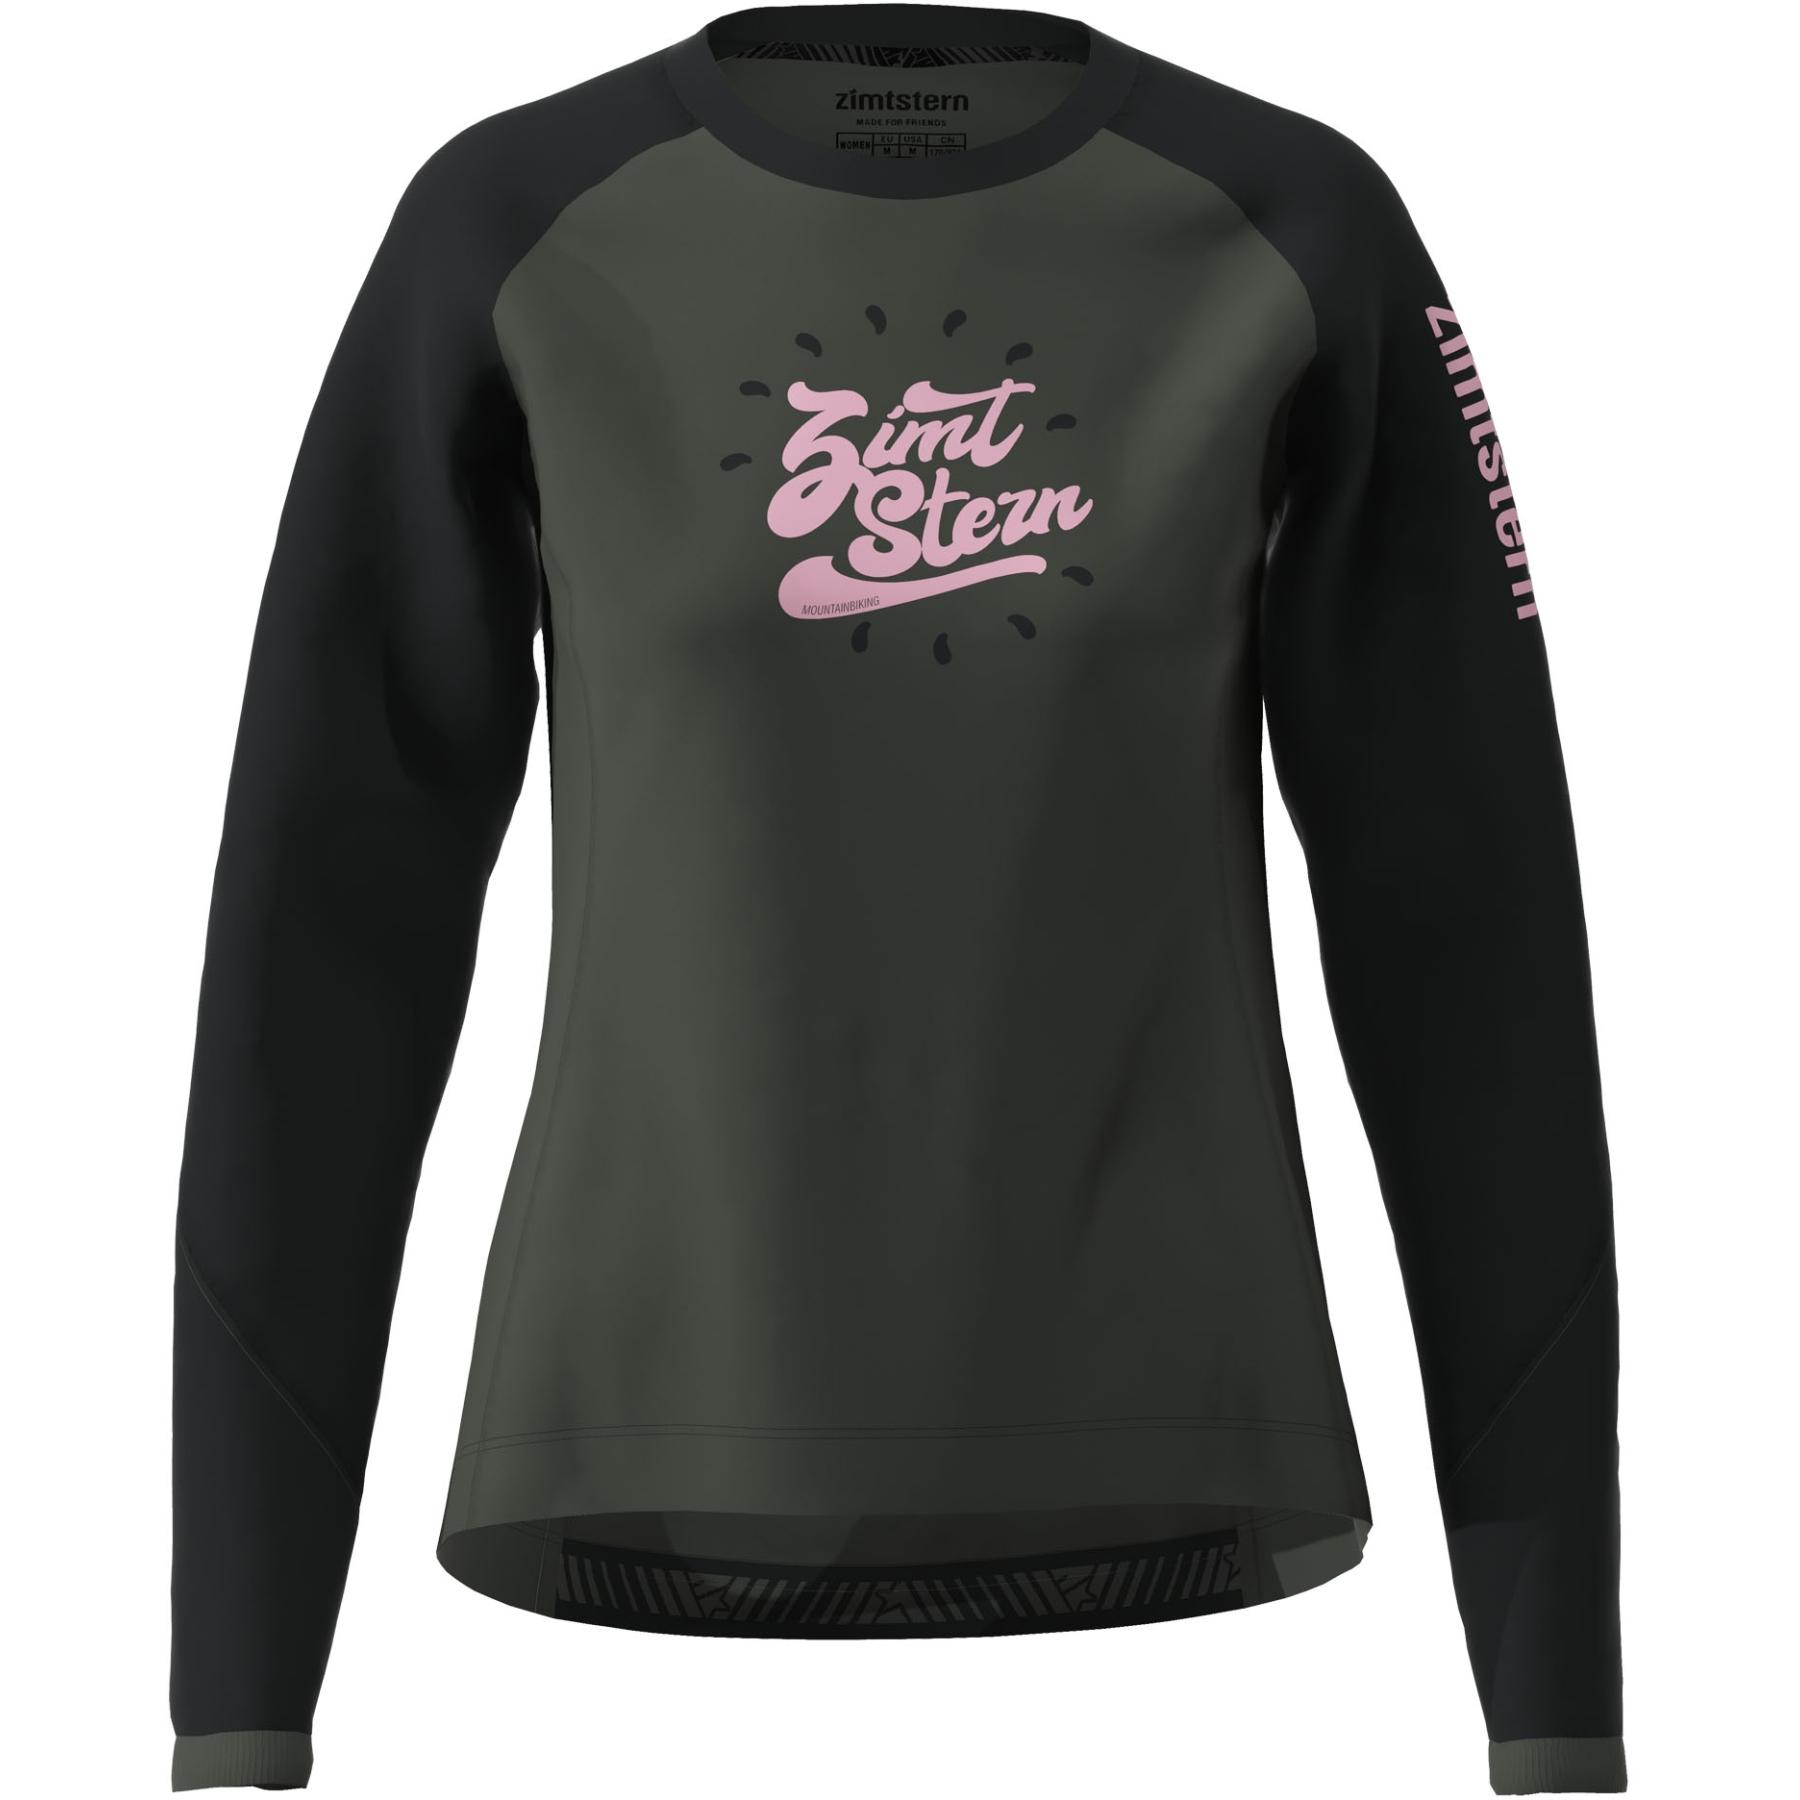 Zimtstern PureFlowz Langarm-Shirt Damen - gun metal/pirate black